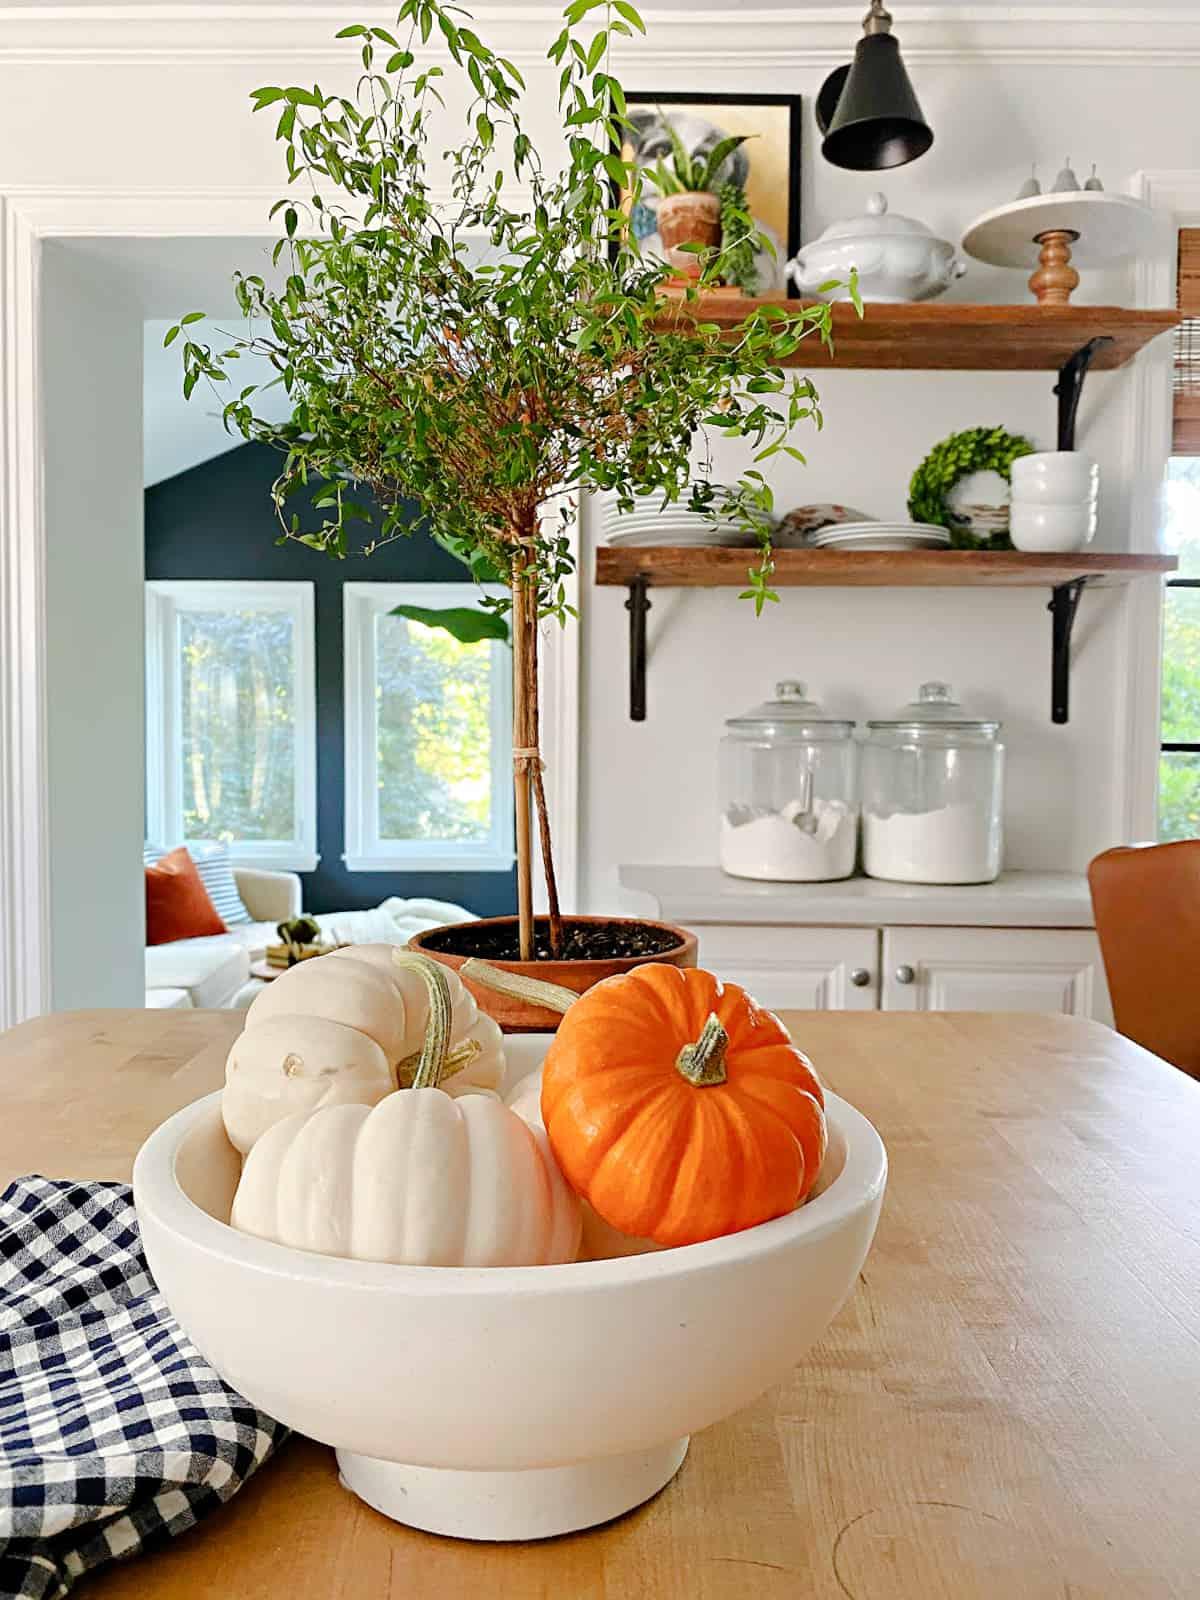 bowl of small pumpkins